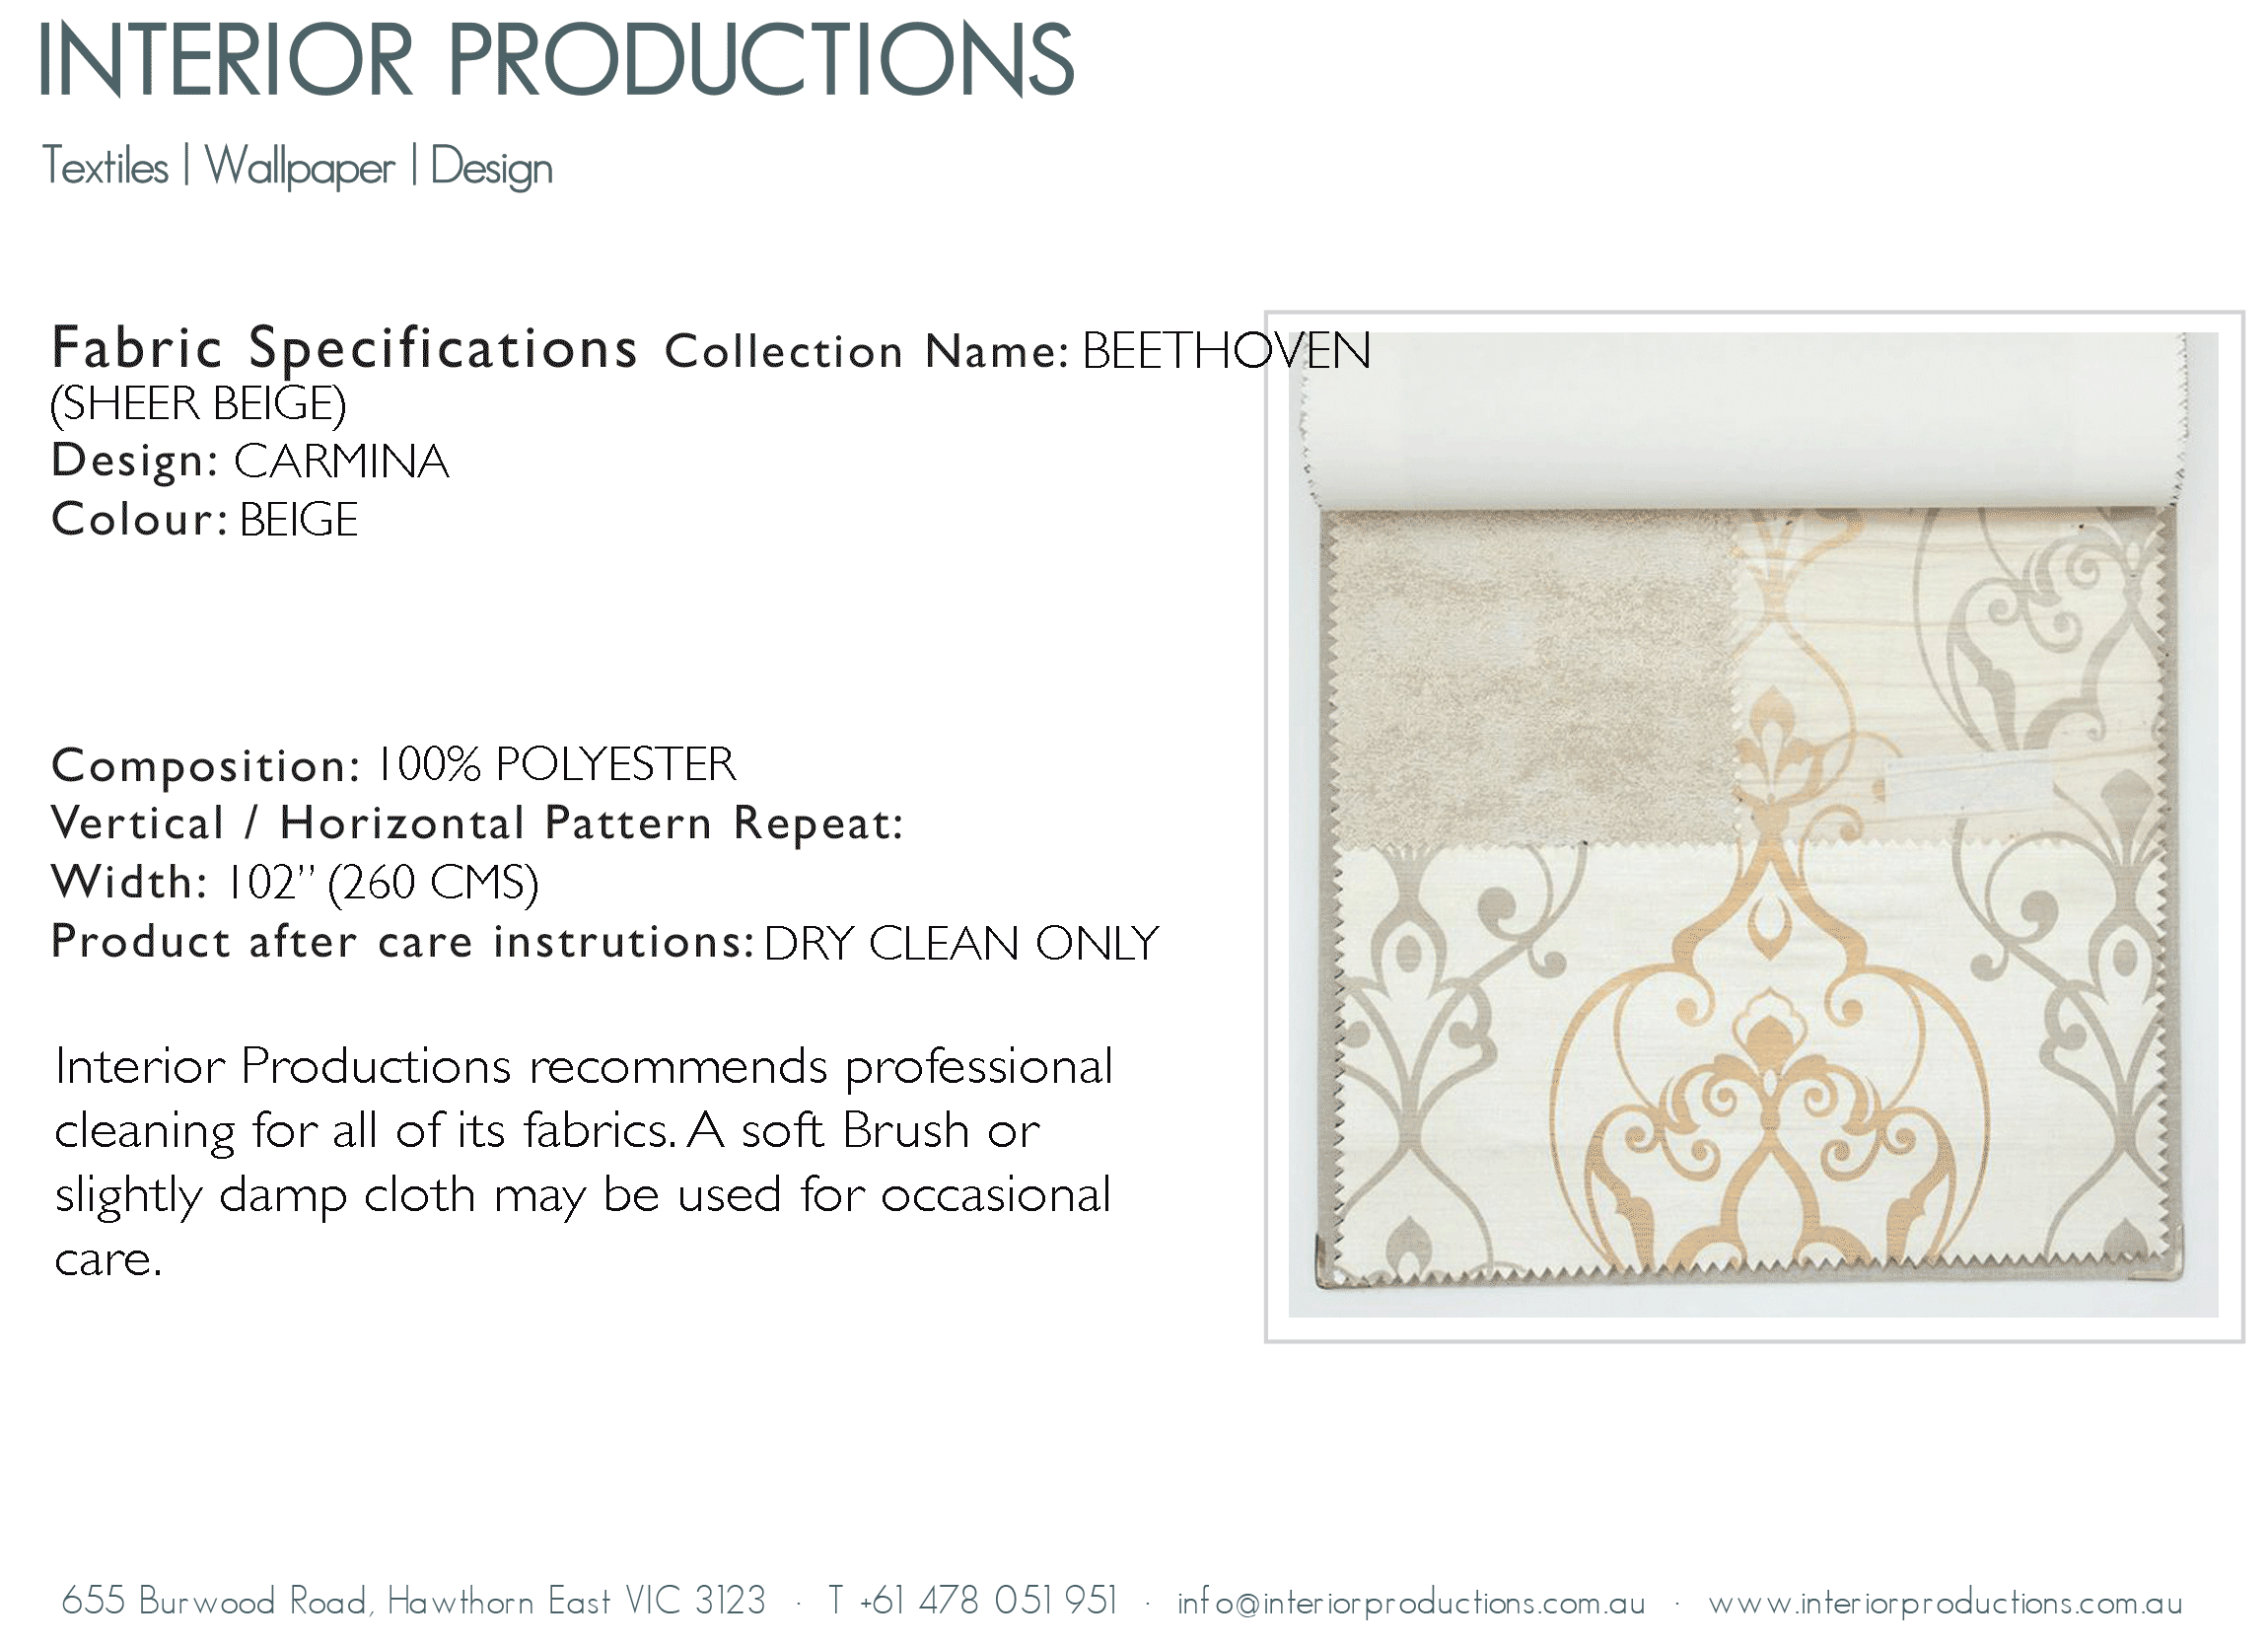 interior_productions_CARMINA---BEIGE